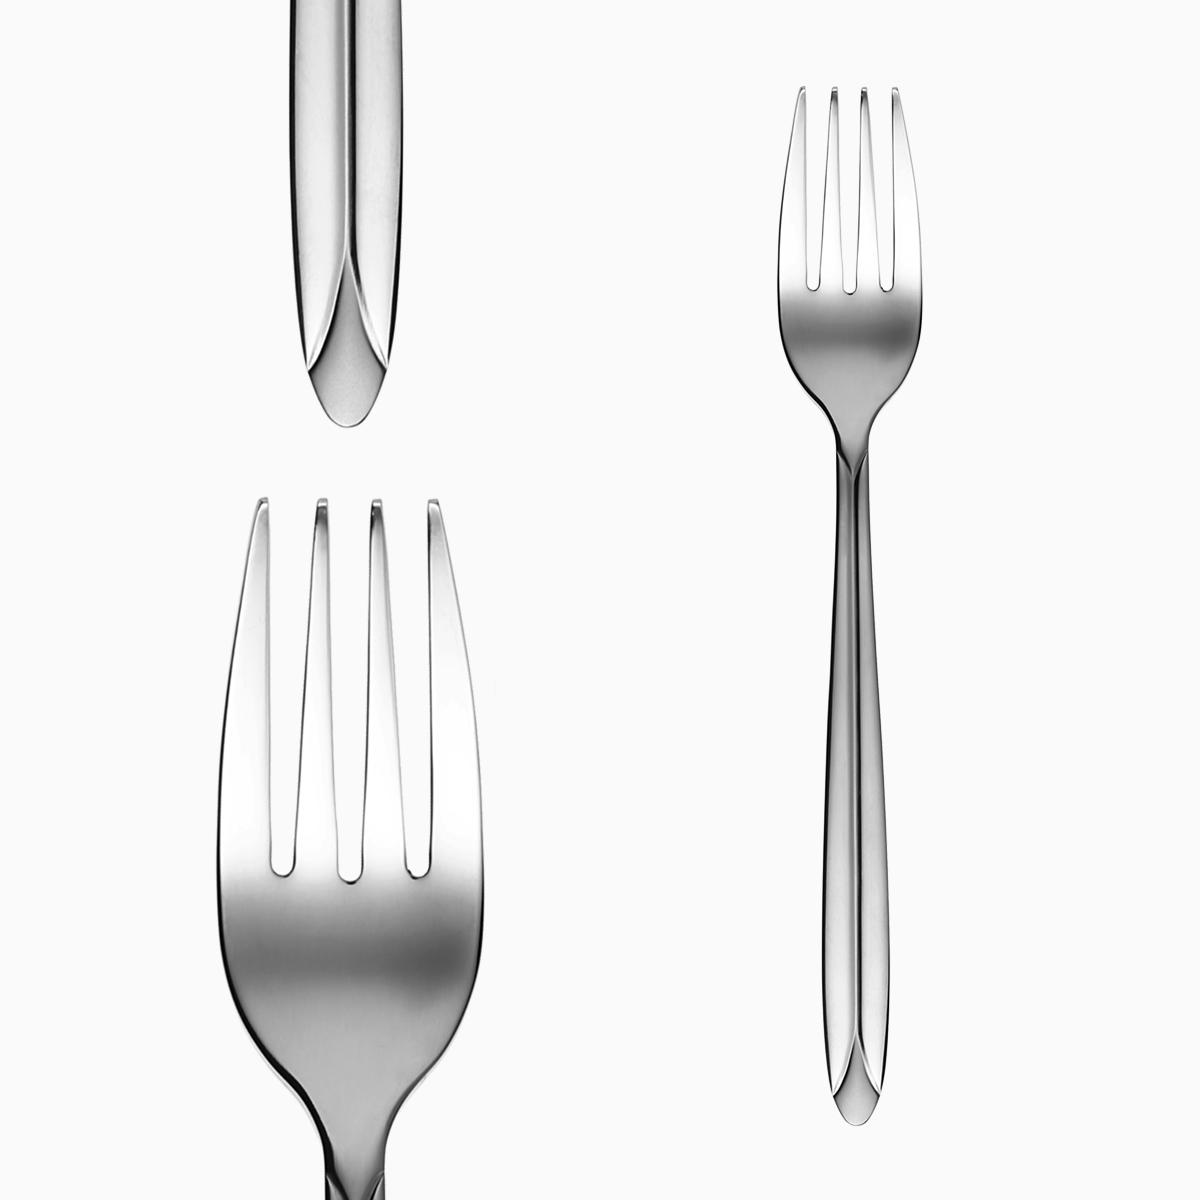 Table fork - Aruba